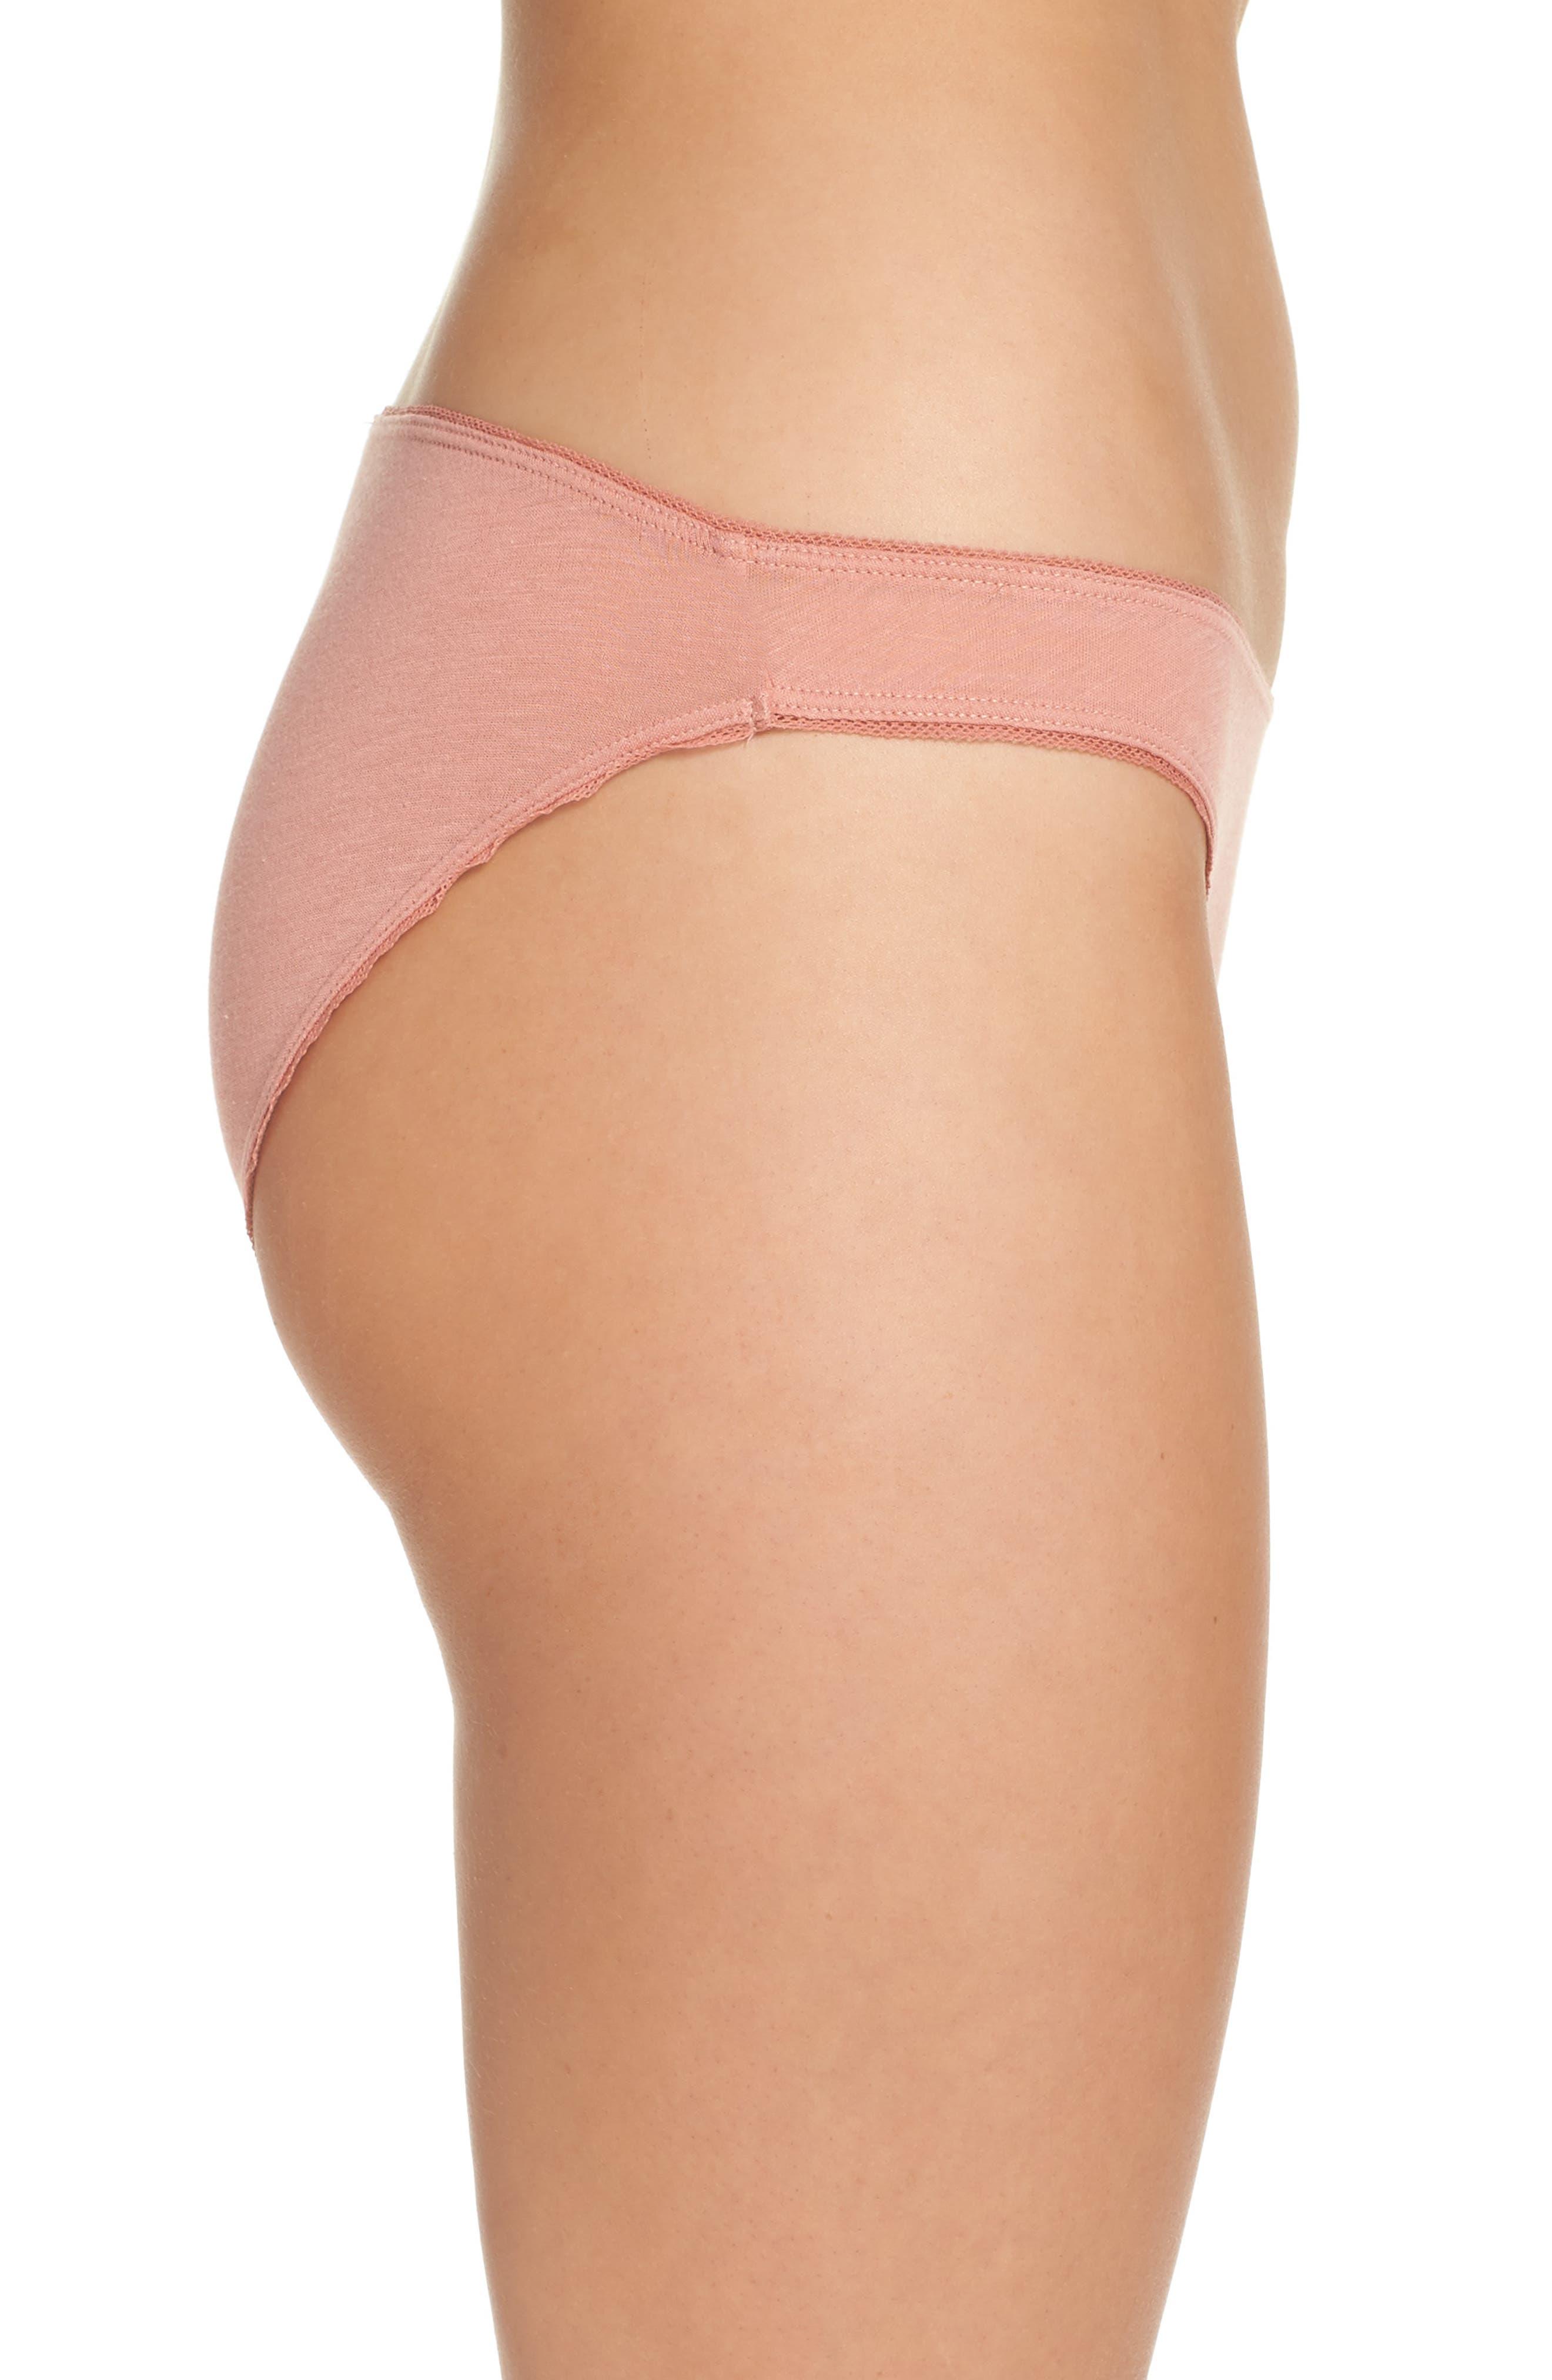 Organic Cotton Bikini,                             Alternate thumbnail 3, color,                             Vintage Pink